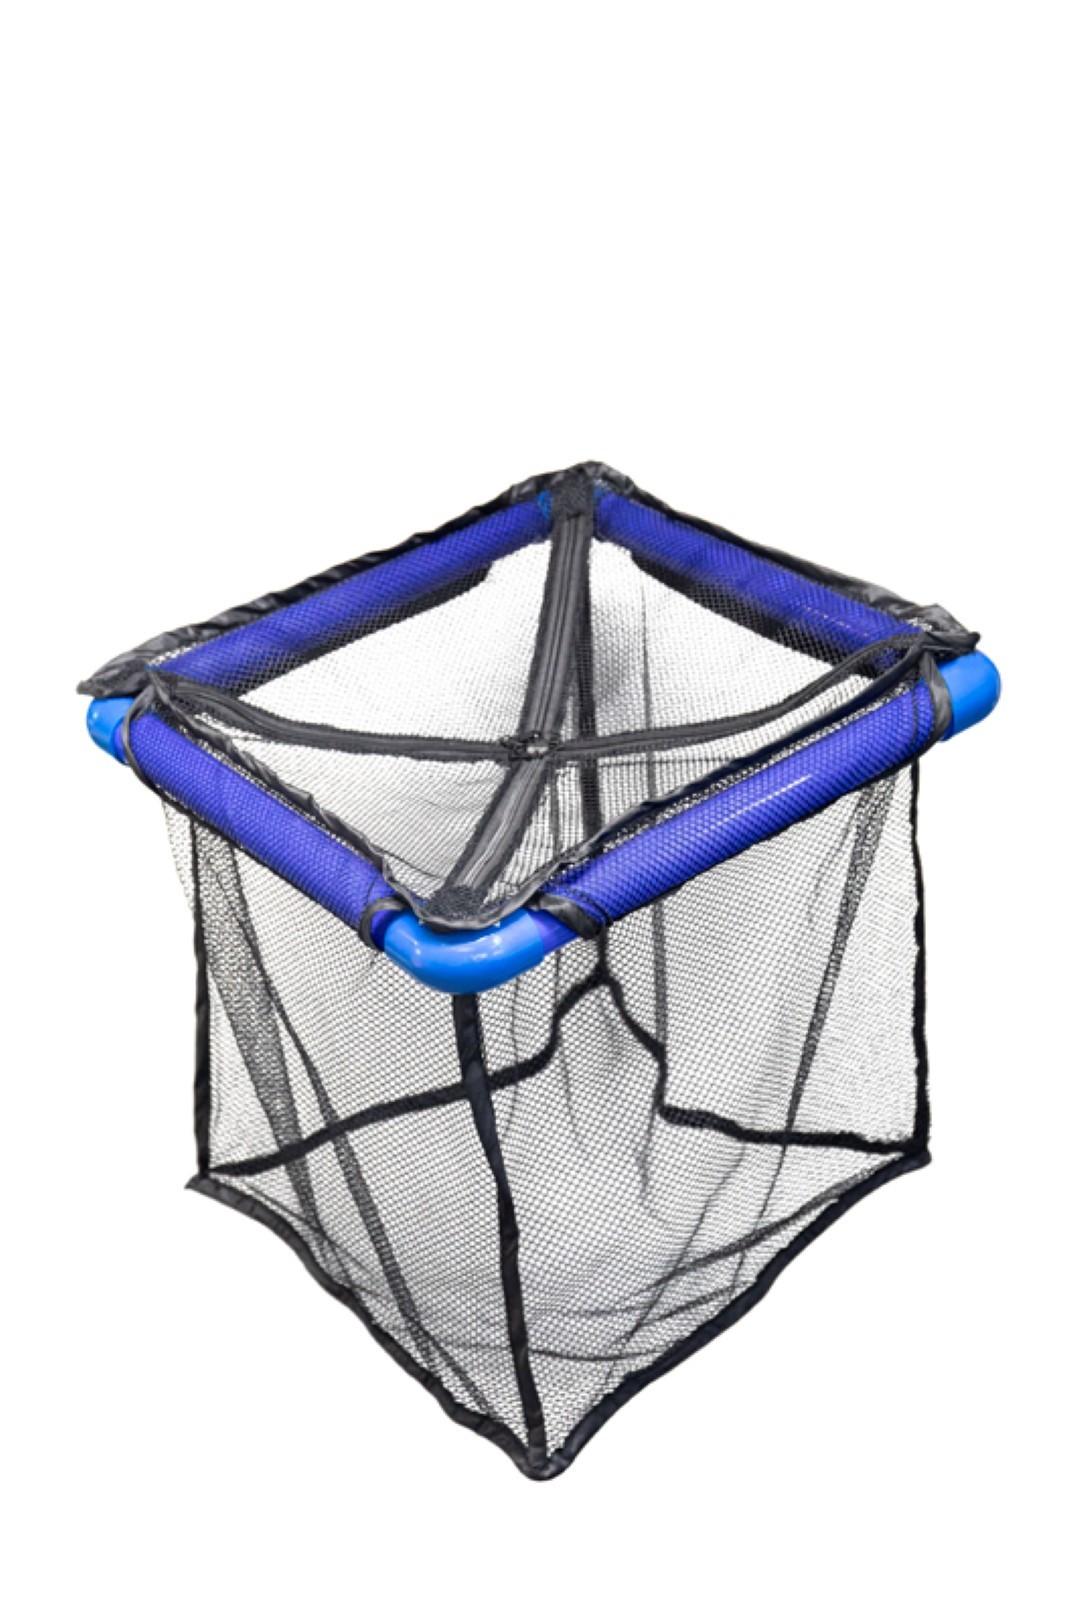 Kp Floating Fish Cage 50X50X50 Cm vijver